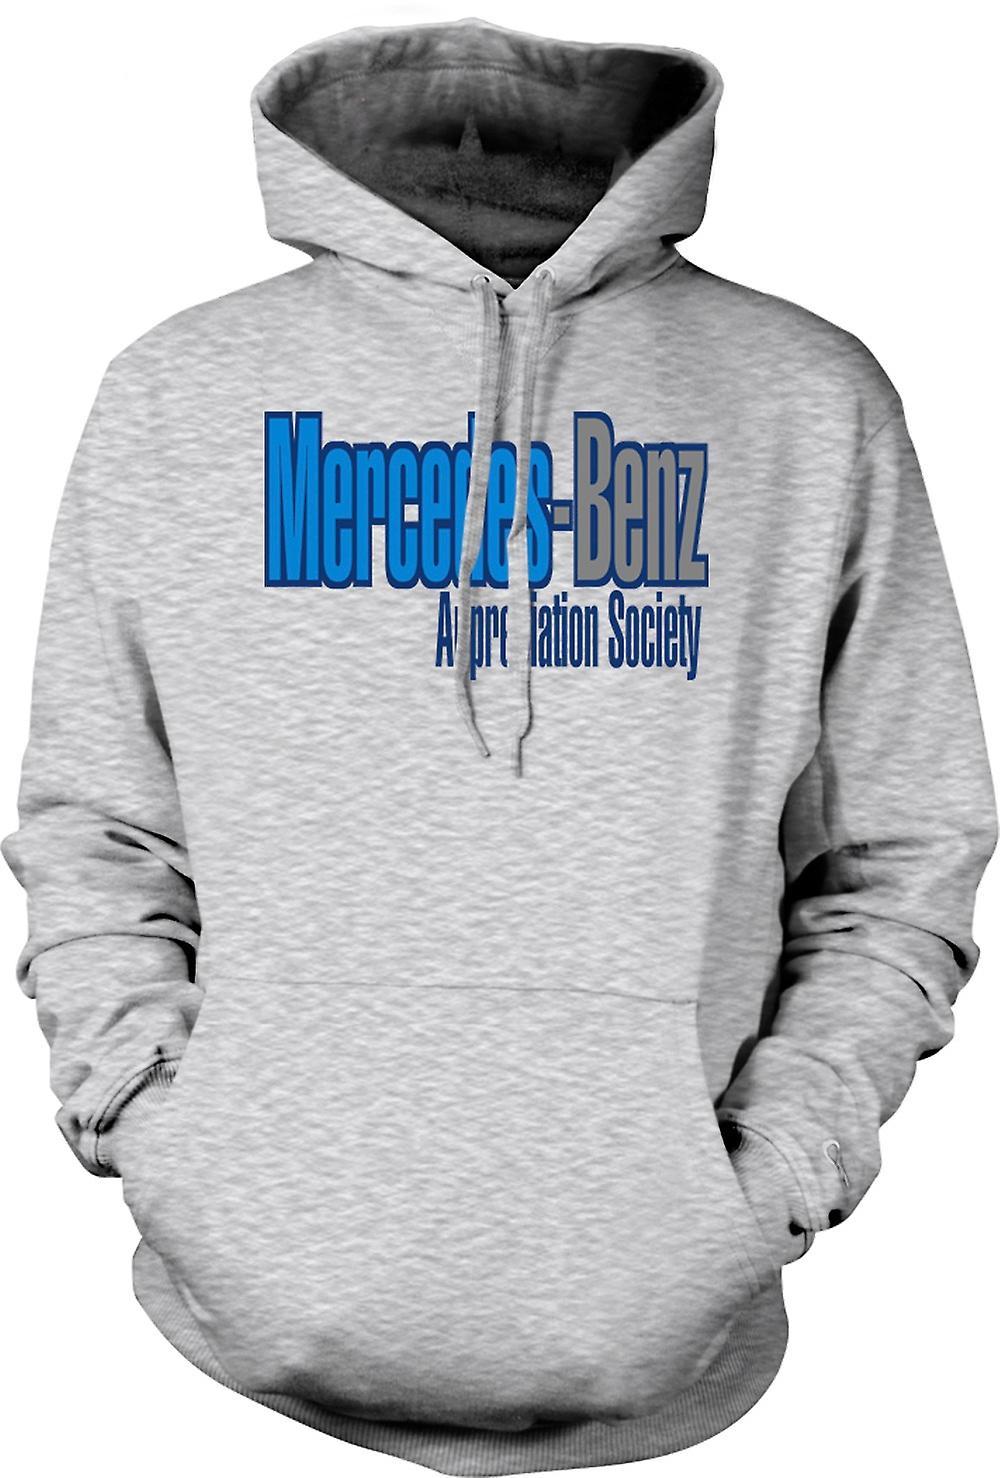 Mens hoodie mercedes benz appreciation society fruugo for Mercedes benz hoodie